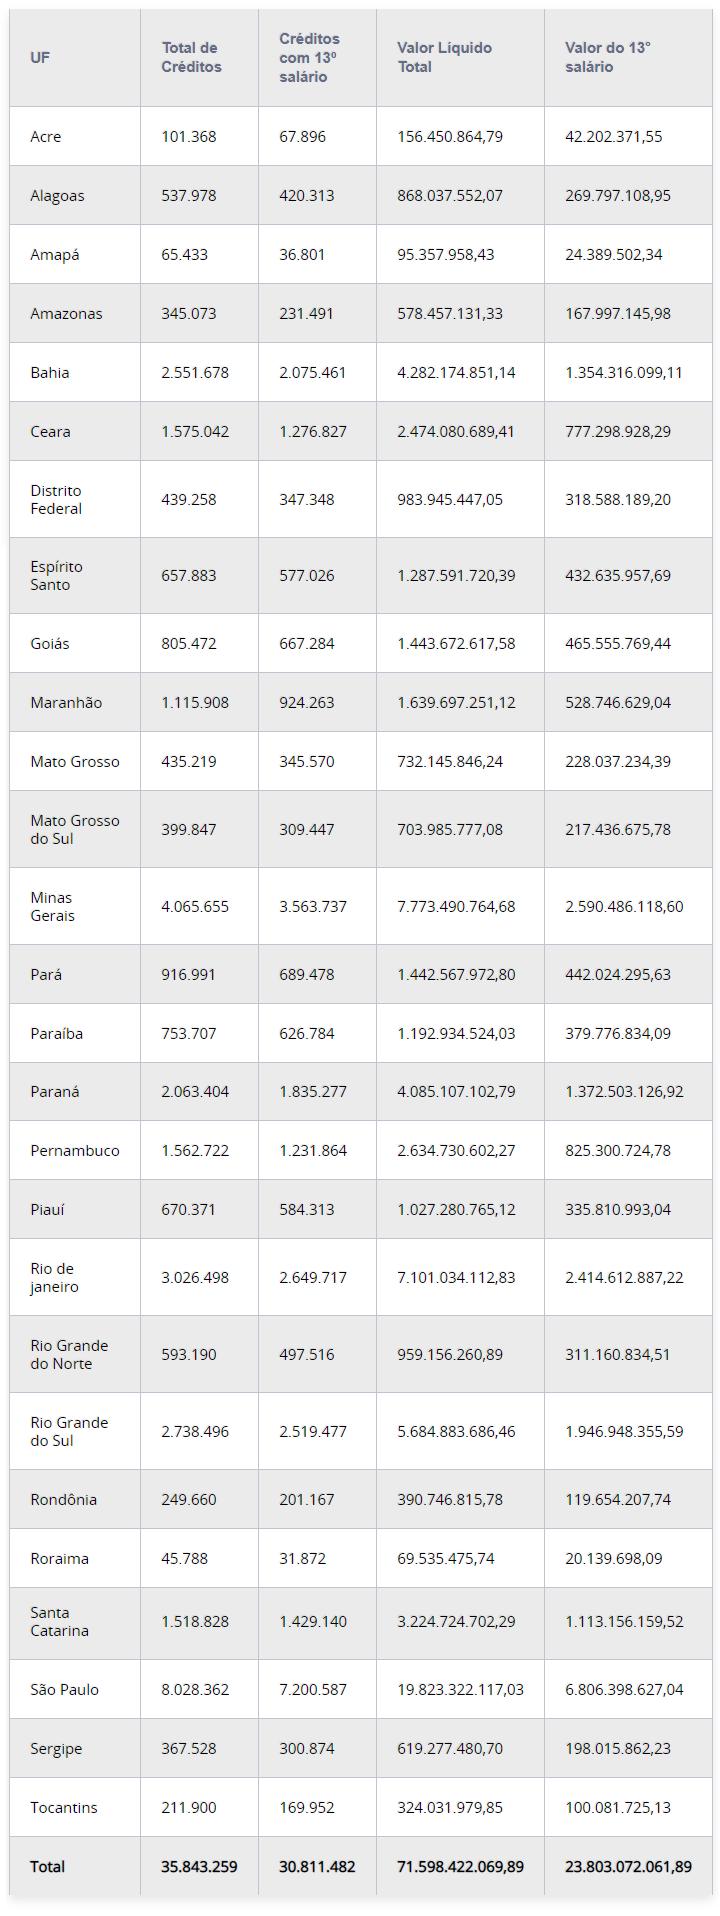 abono-salarial-13º salario-INSS-mai-2020